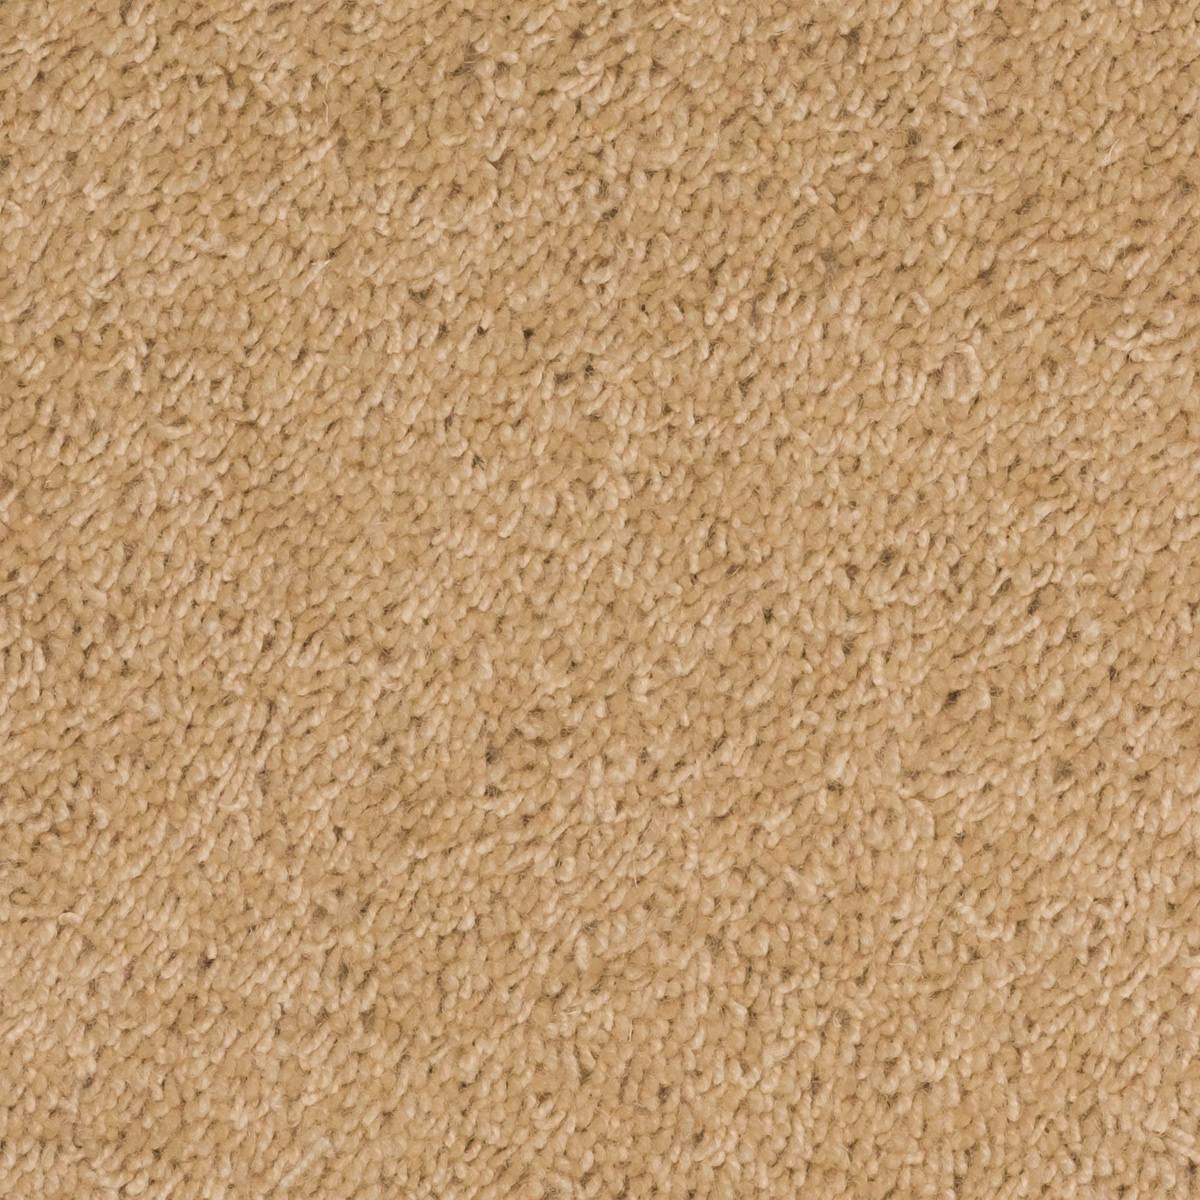 Van Besouw Teppichboden 1805 - Farbe 510